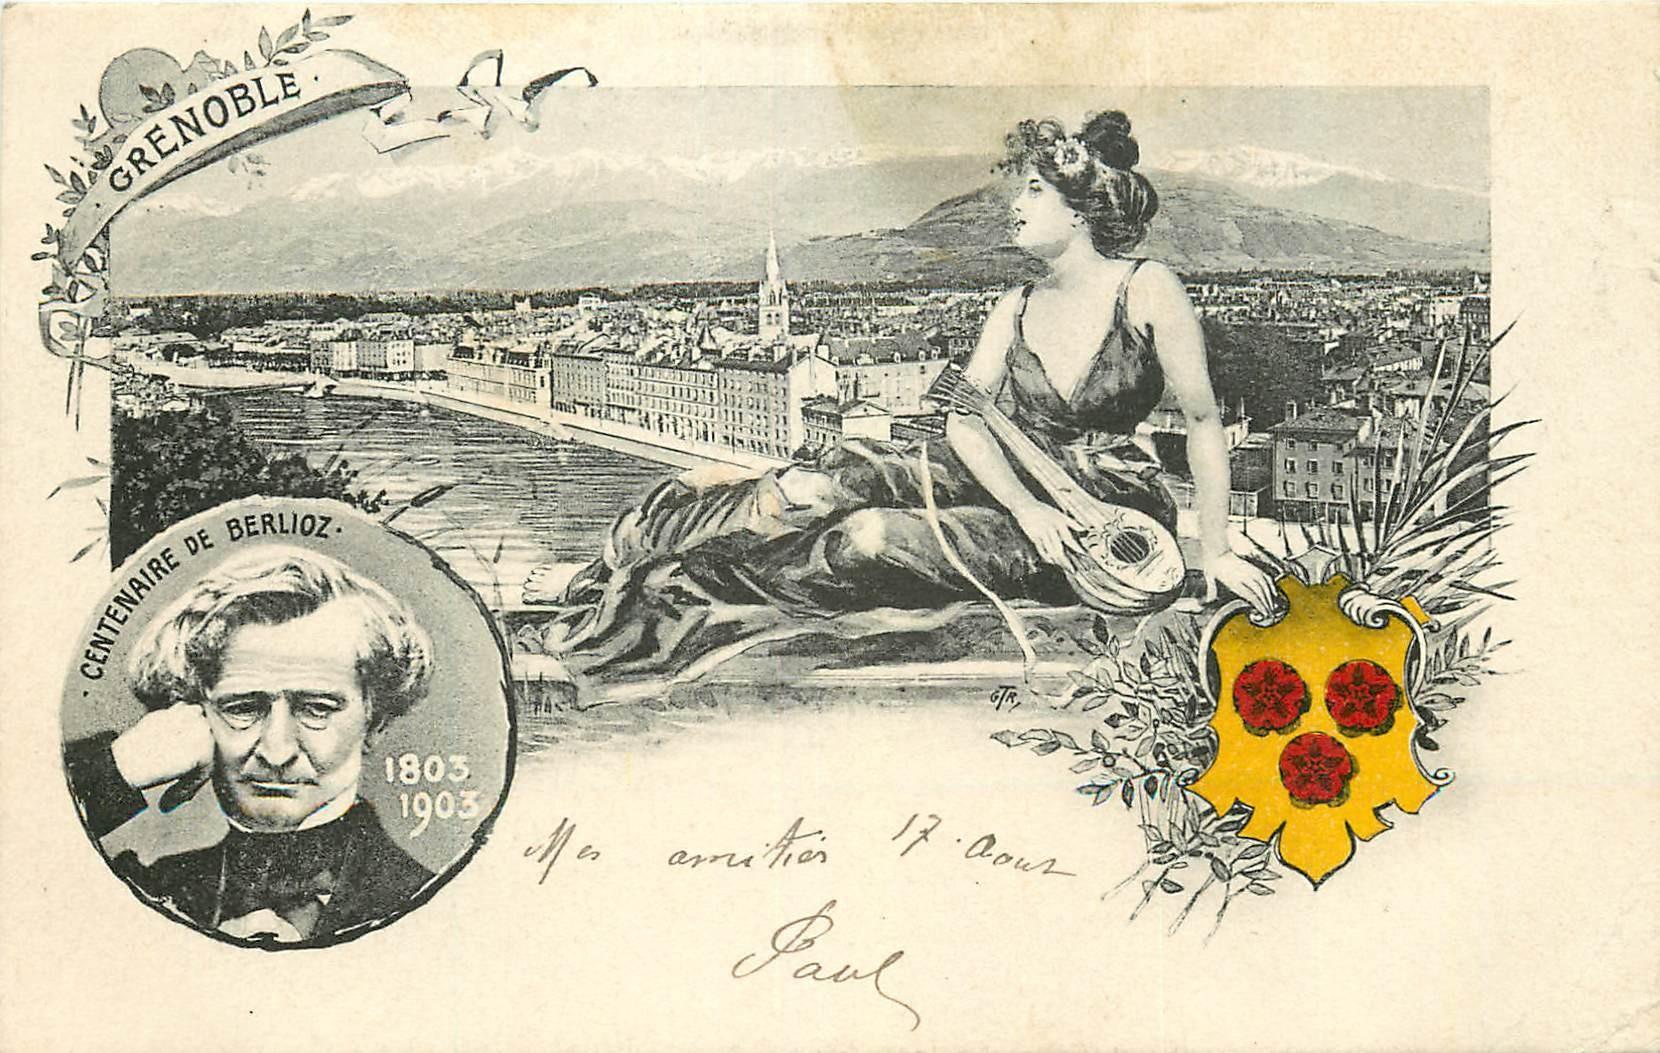 38 GRENOBLE. Centenaire de Berlioz 1903